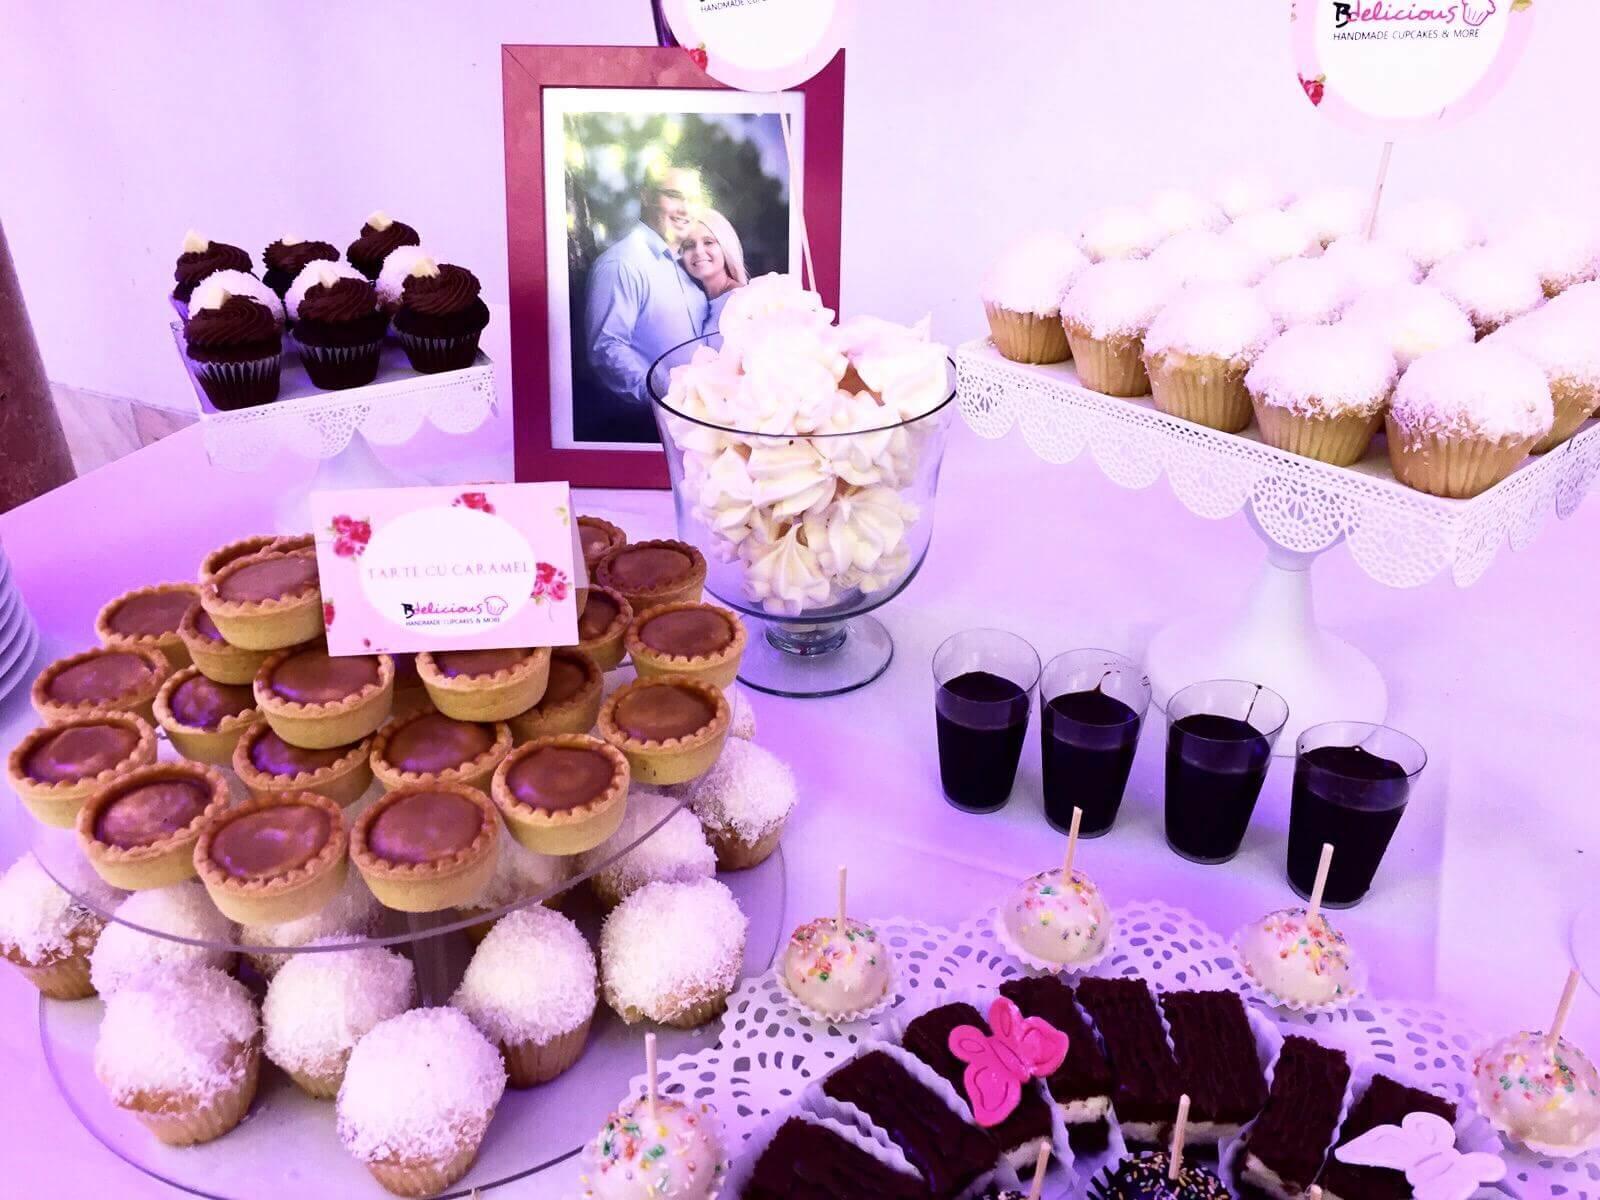 candy bar nuntă tort botez brioșe și prăjituri bdelicious brașov